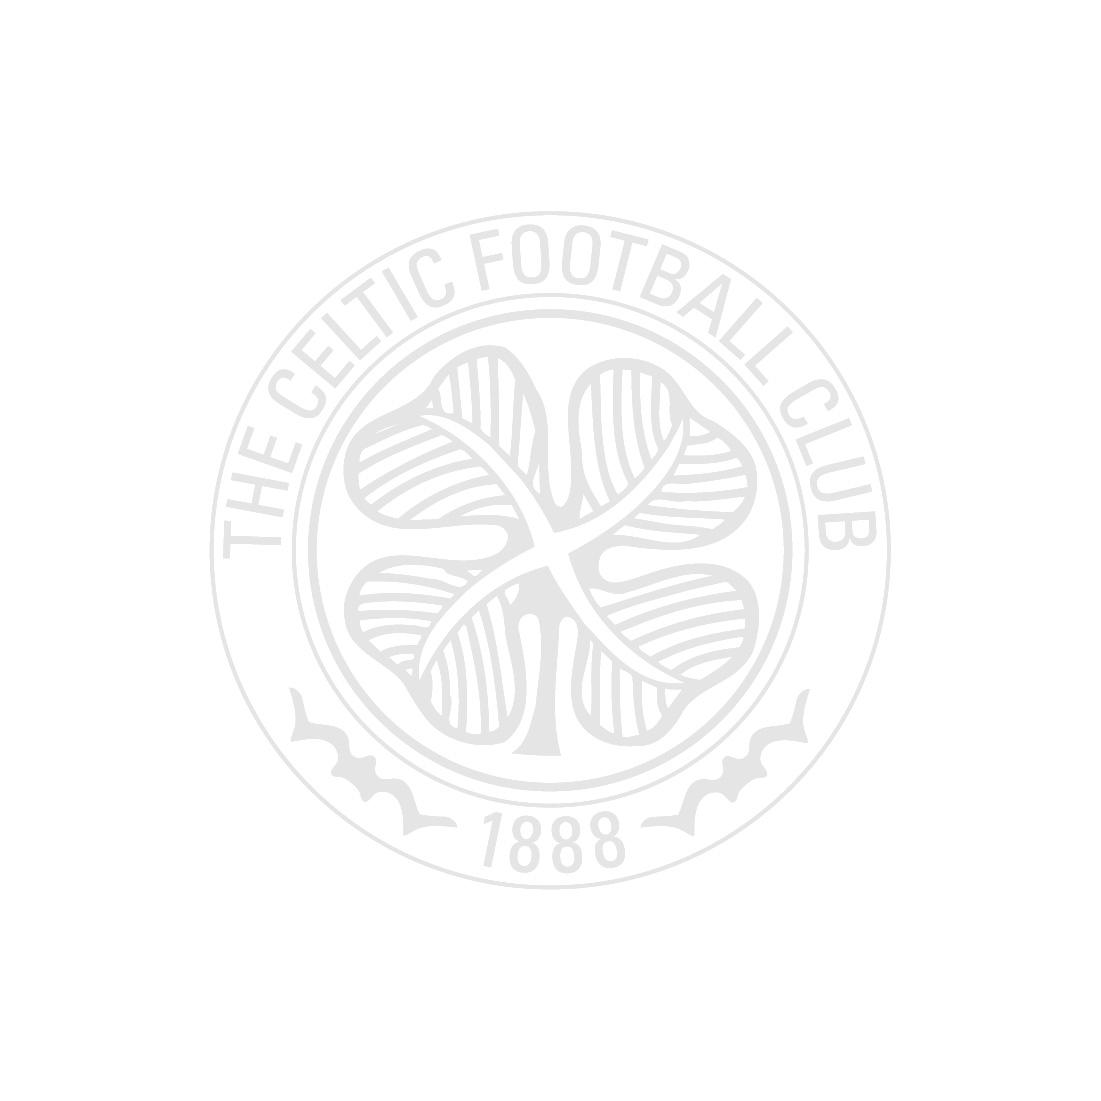 Celtic Kyogo Celebration T-shirt